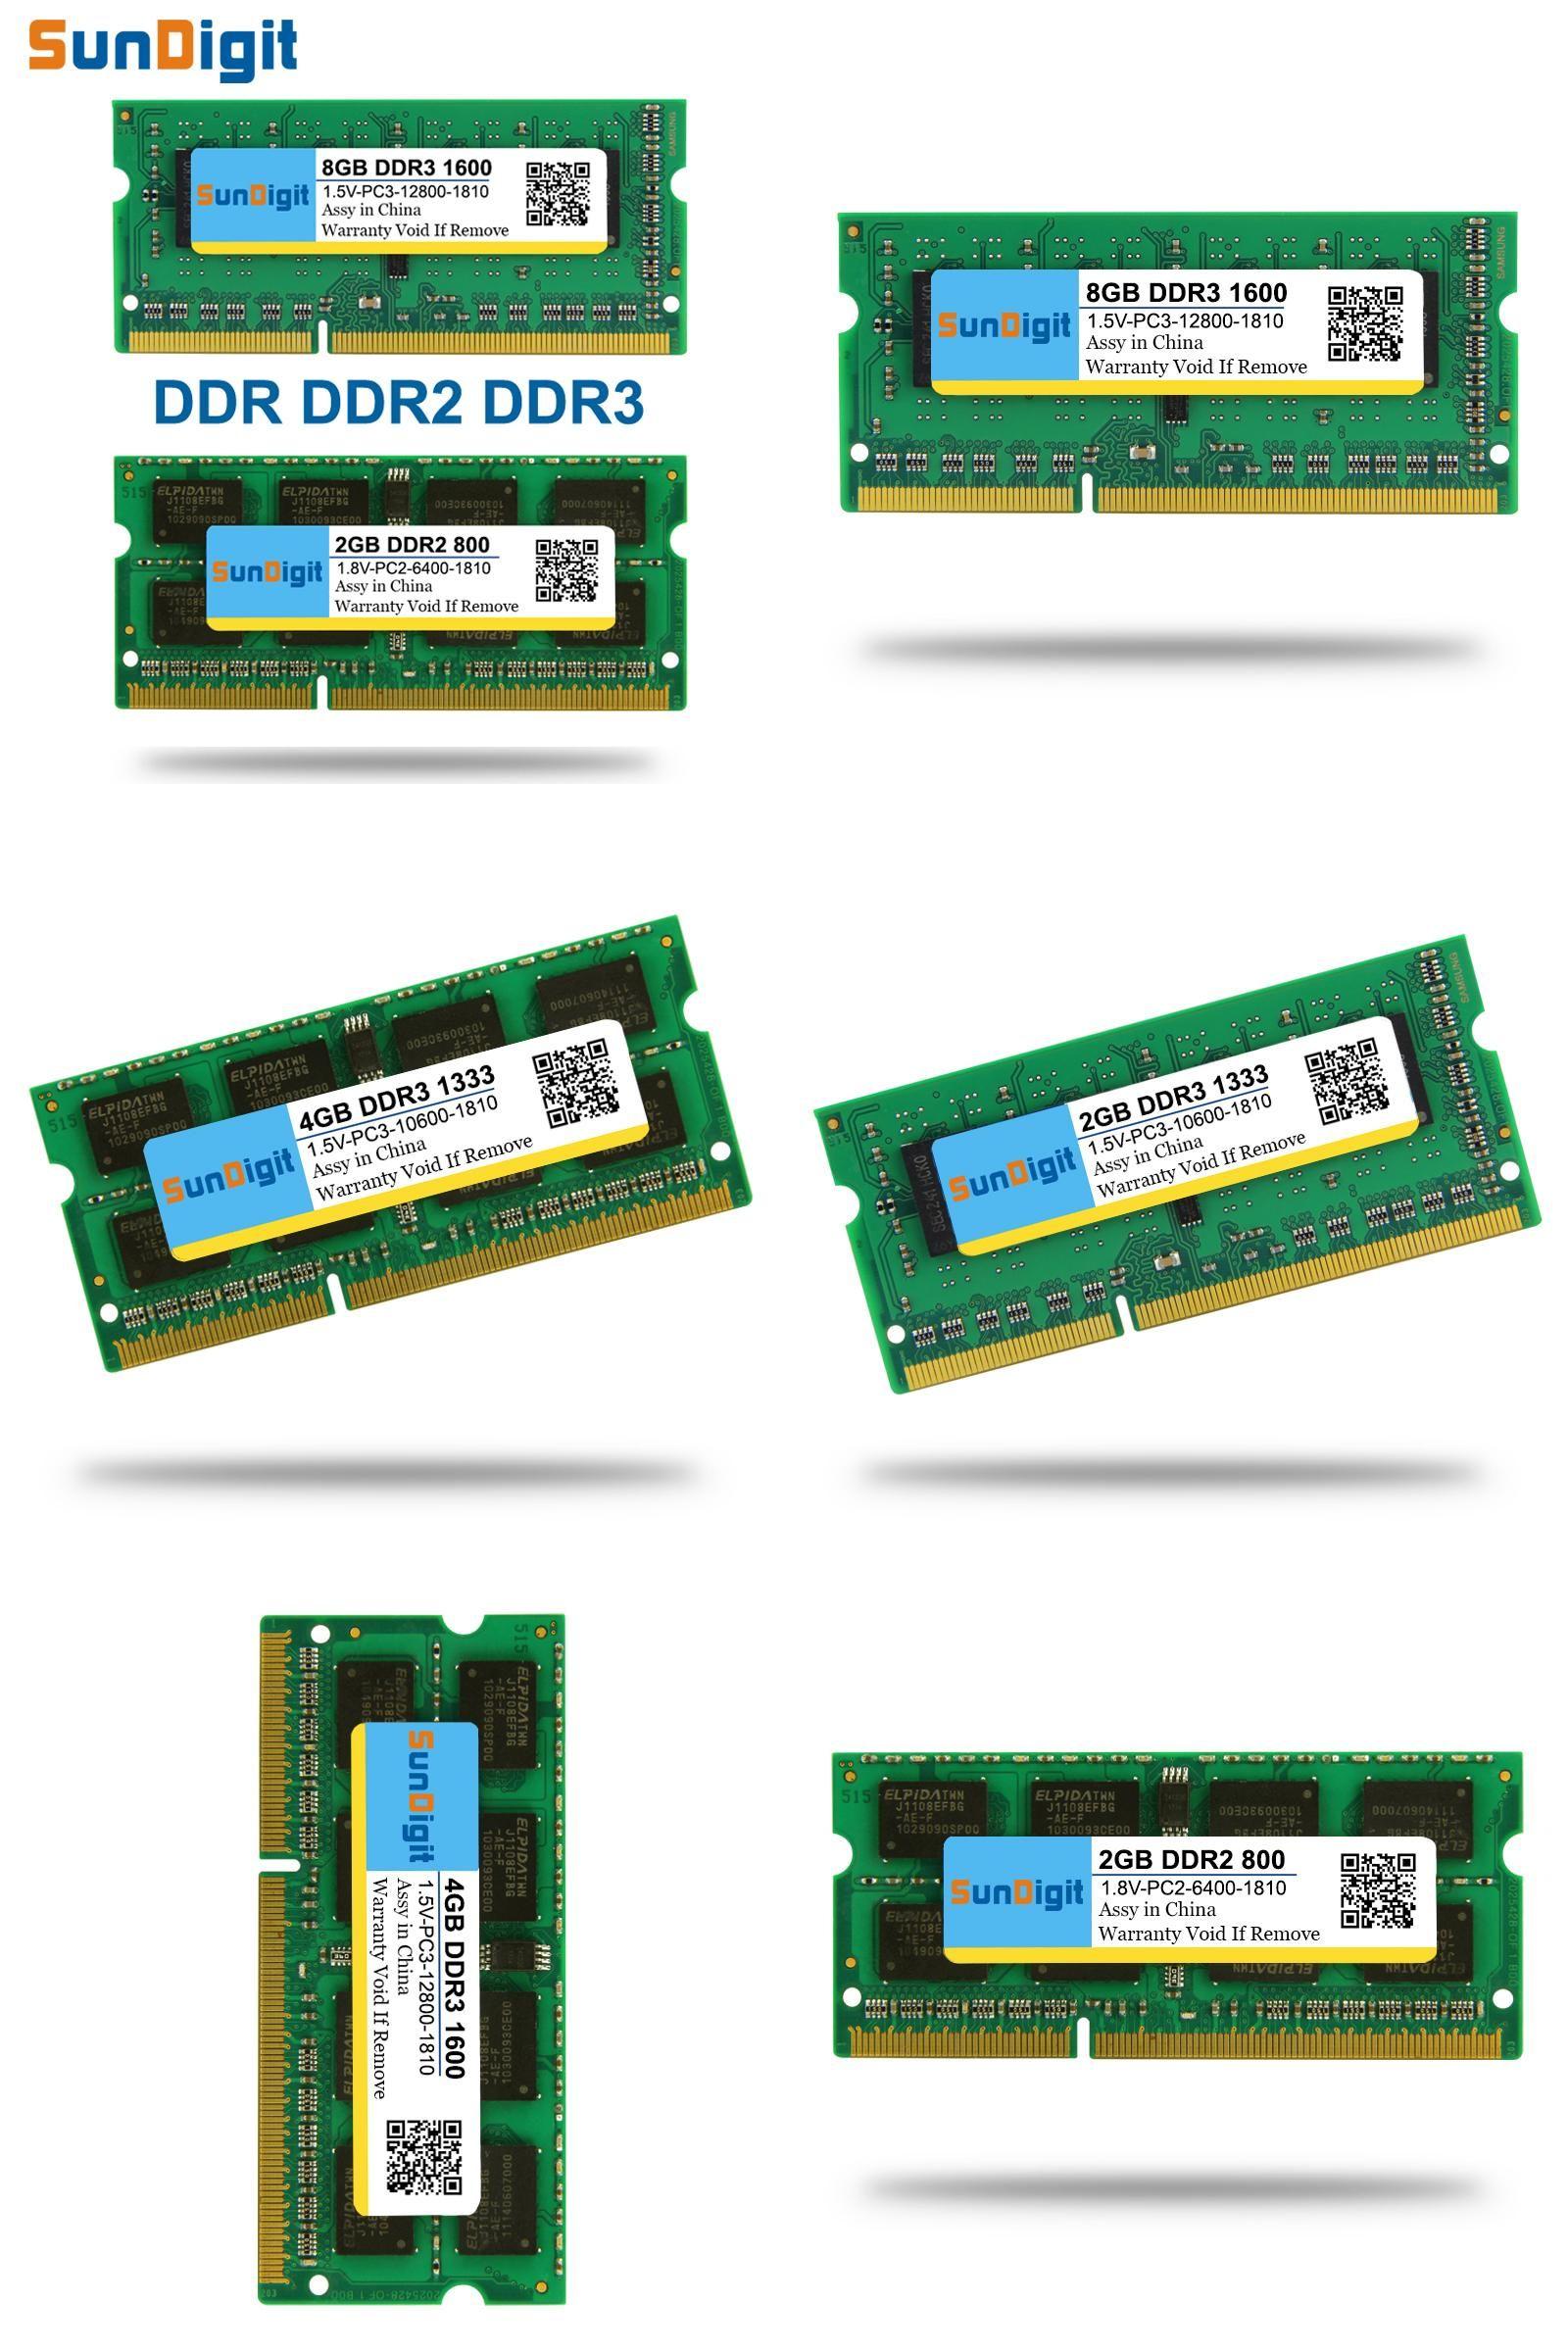 Visit To Buy Brand Sundigit Laptop Memory Ram Ddr1 Ddr2 Ddr3 400mhz Ddr 1 512 Mb 800mhz 1333mhz